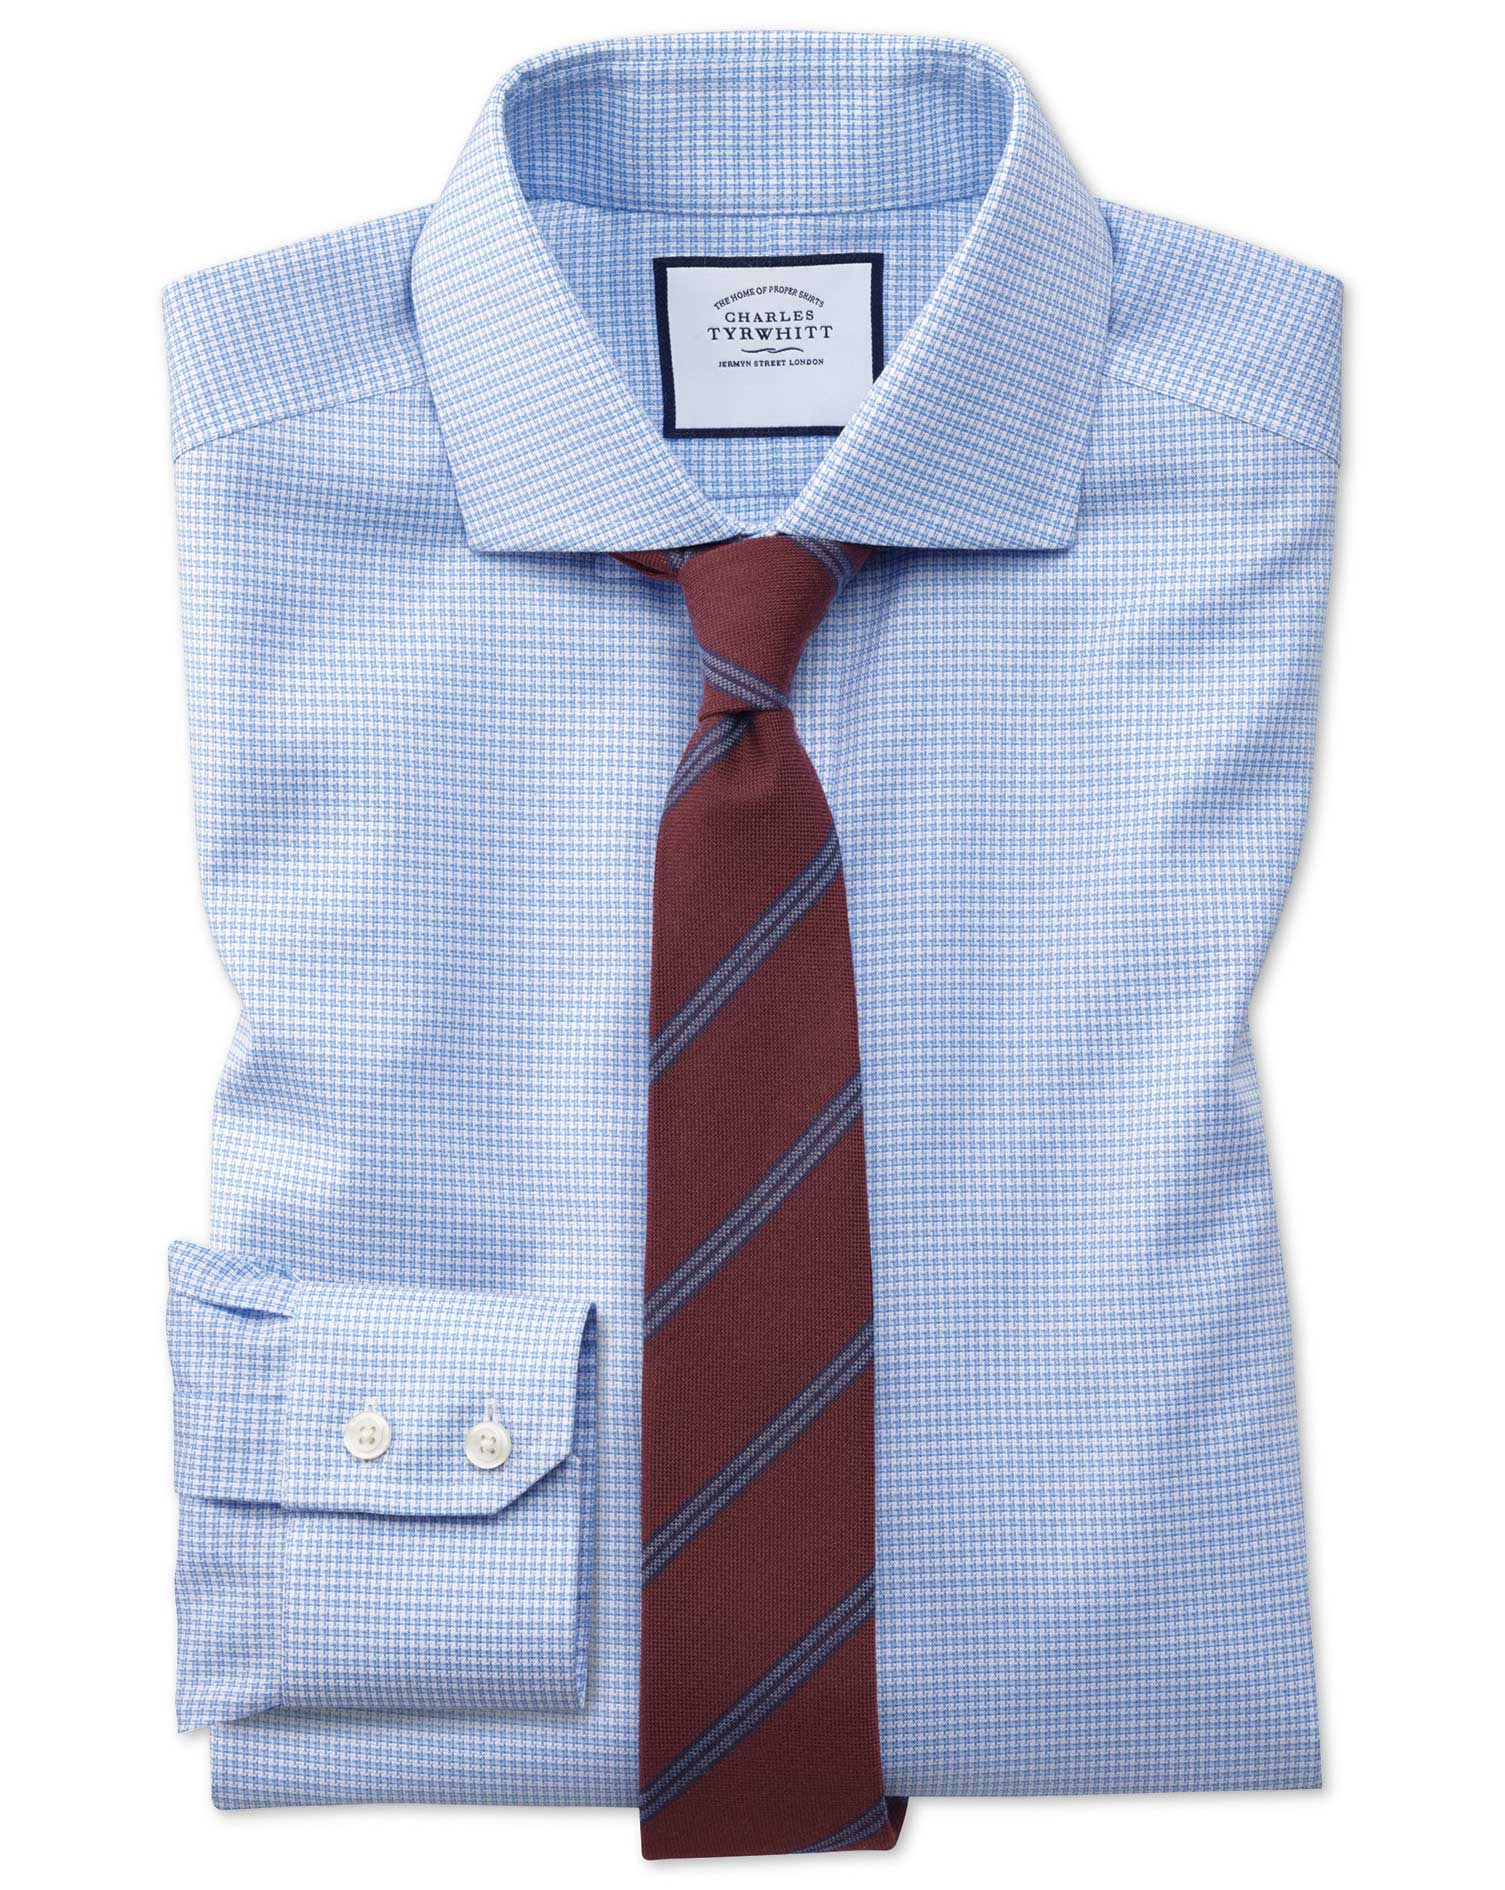 Extra Slim Fit Non-Iron Cutaway Collar Sky Blue Puppytooth Oxford Stretch Cotton Formal Shirt Single